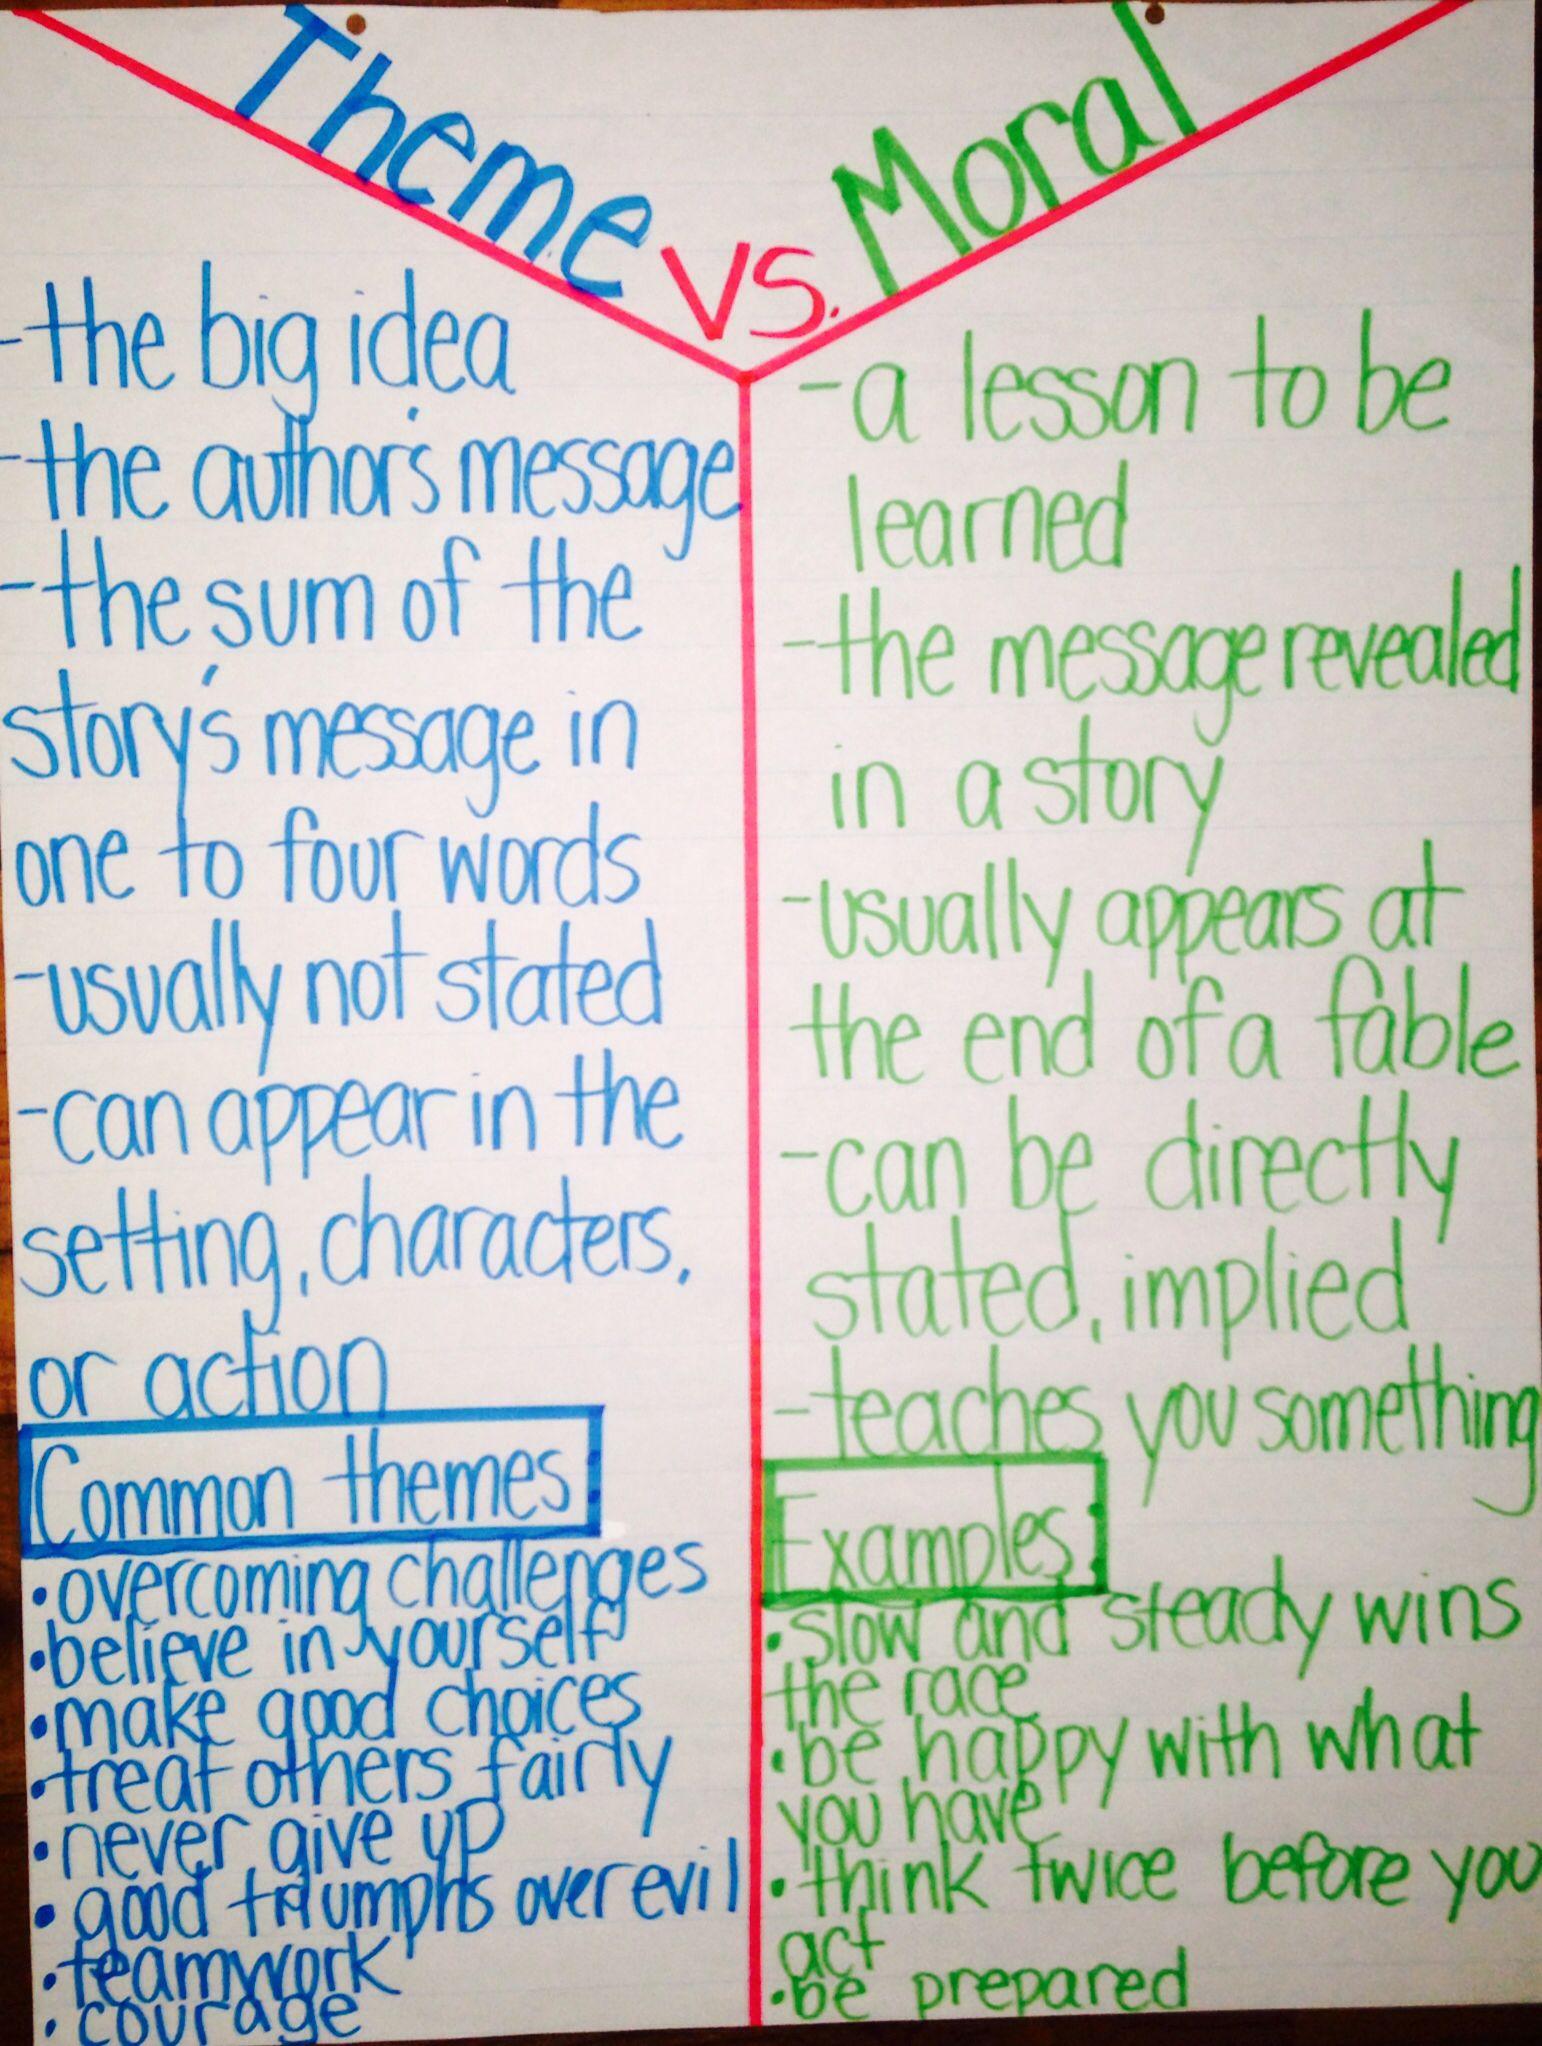 Theme Vs Moral Anchor Chart